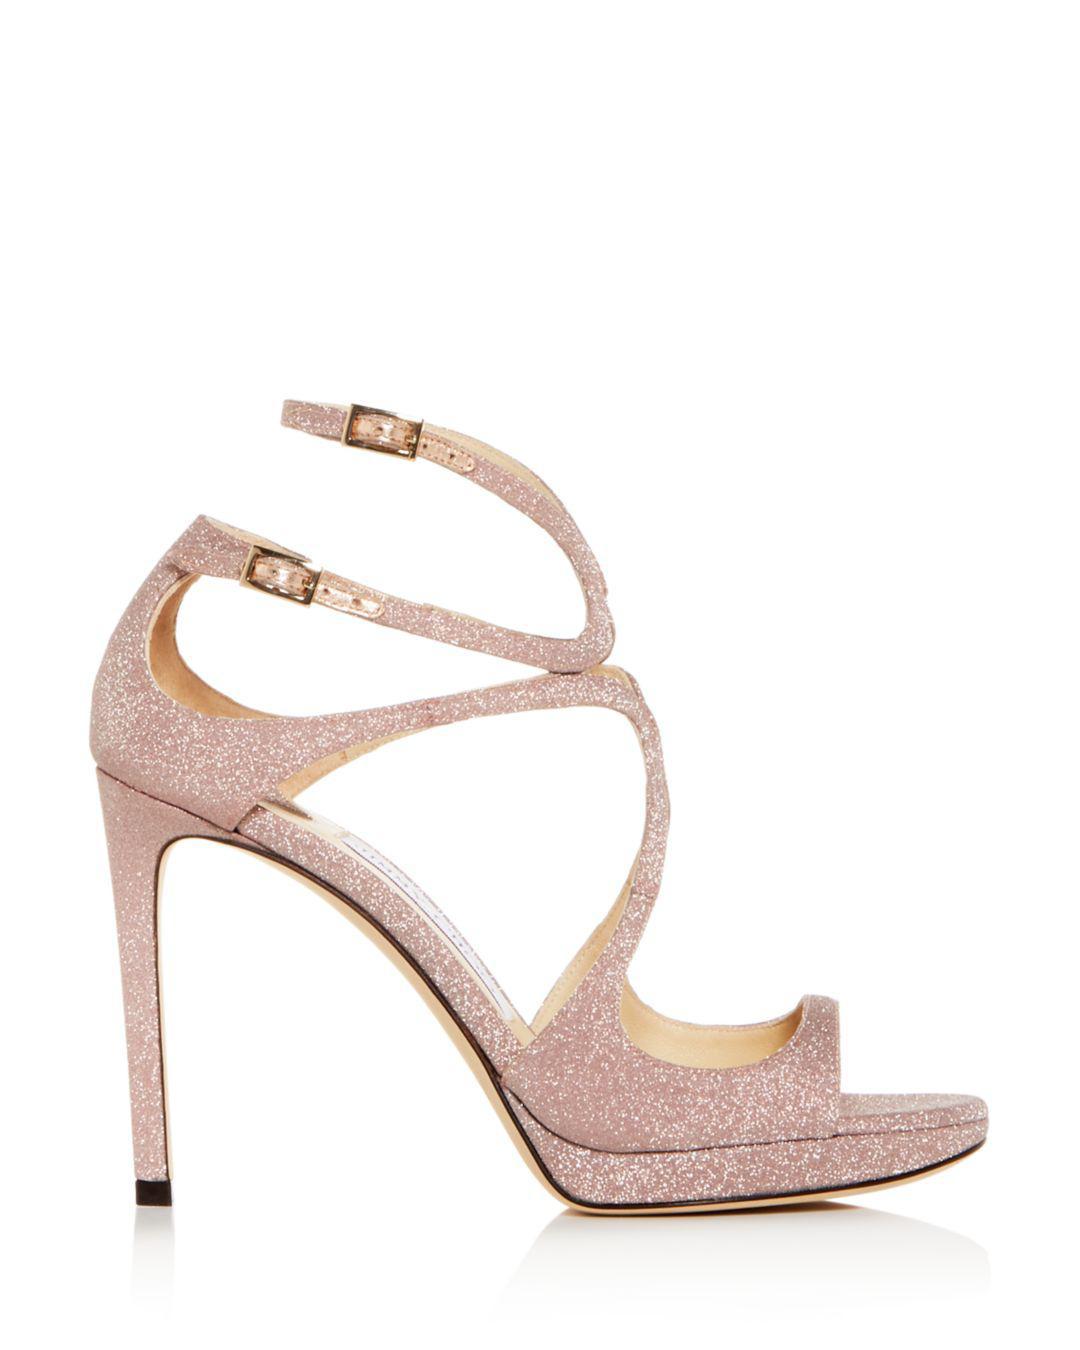 e03b73a3f4ba Lyst - Jimmy Choo Metallic Slingback Sandals in Pink